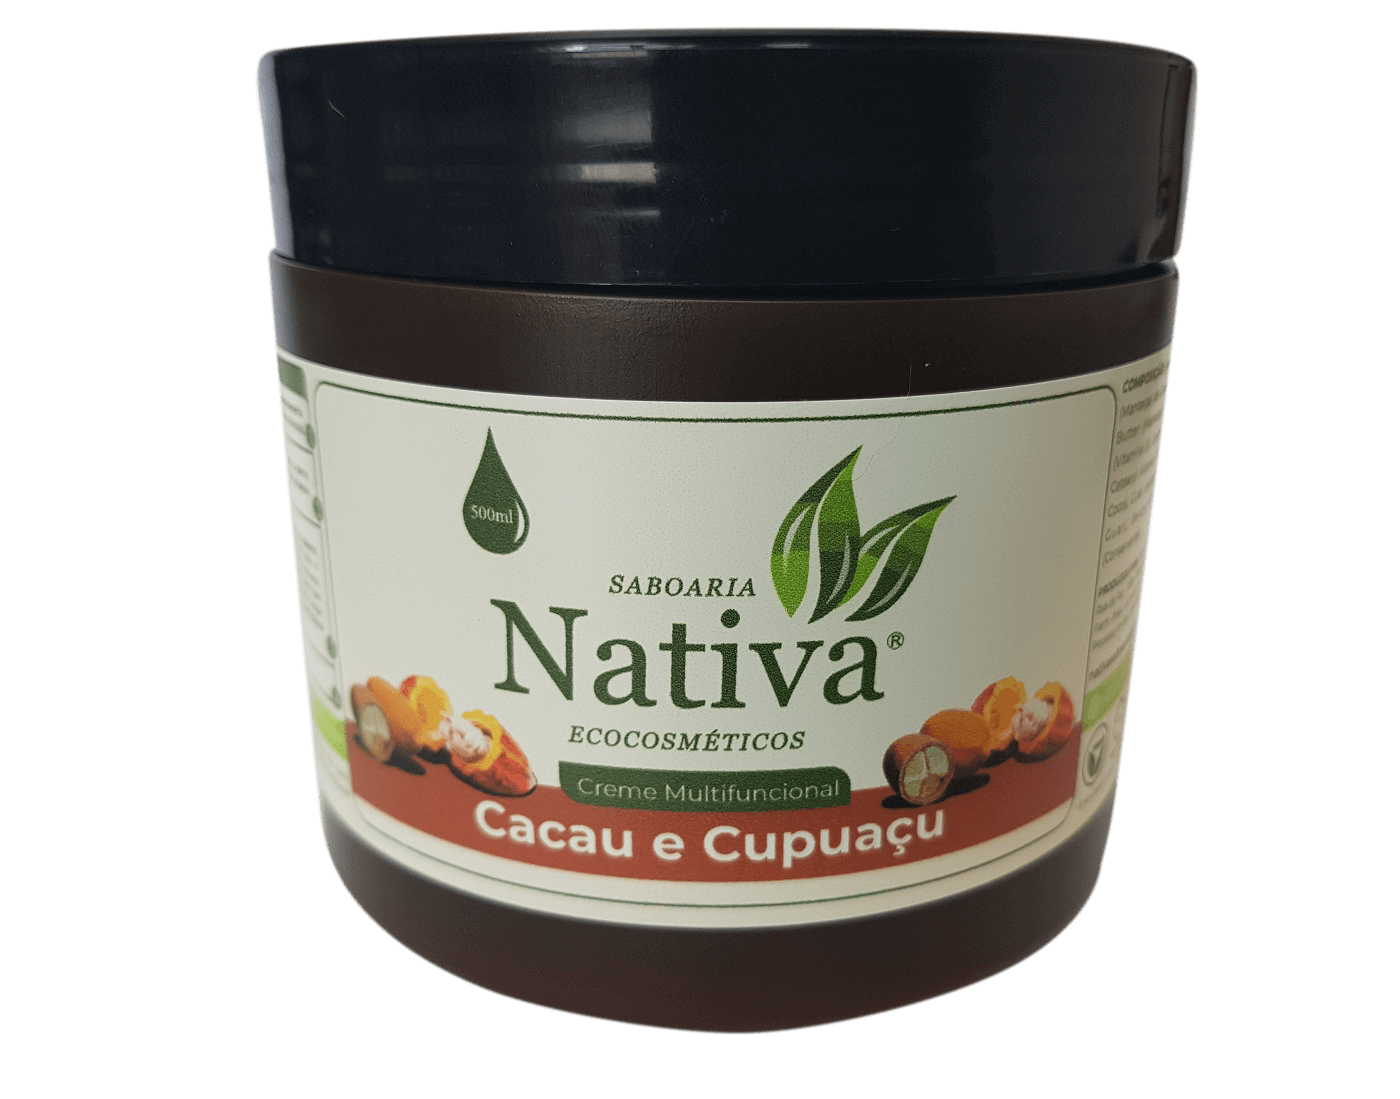 Creme Multifuncional Cacau e Cupuaçu - 500ml  - Saboaria Nativa Ecocosméticos